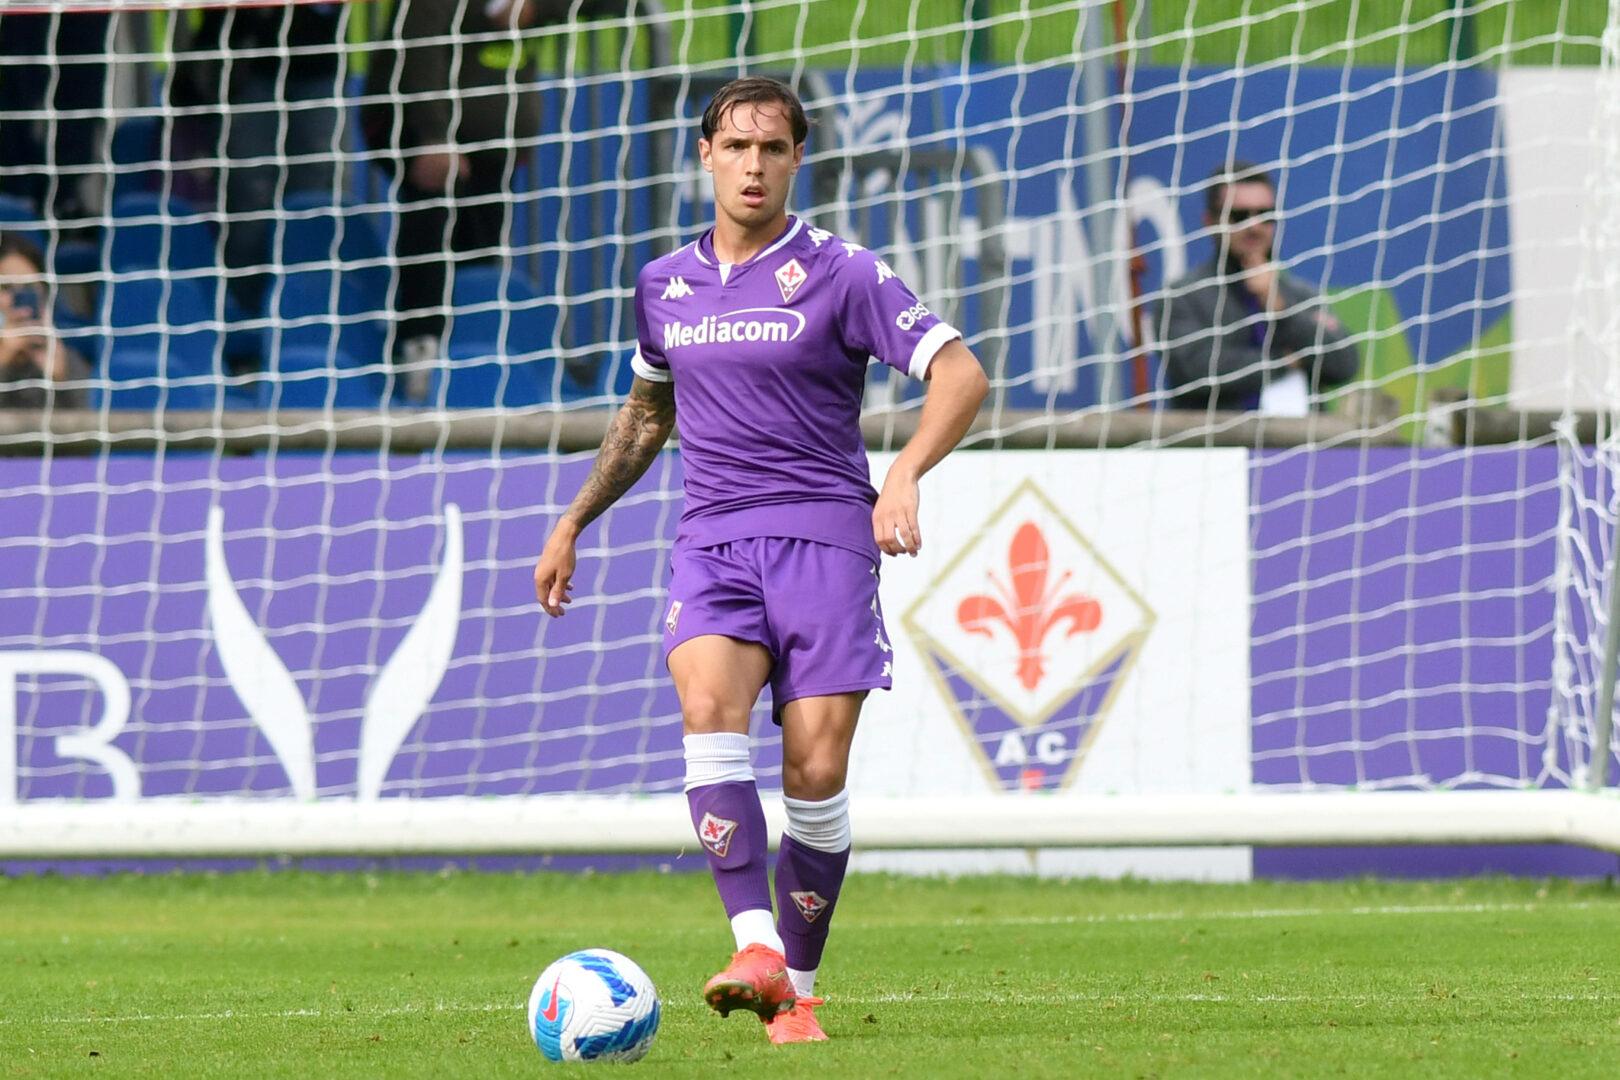 Fiorentina   Atalanta mit Interesse an Pol Lirola